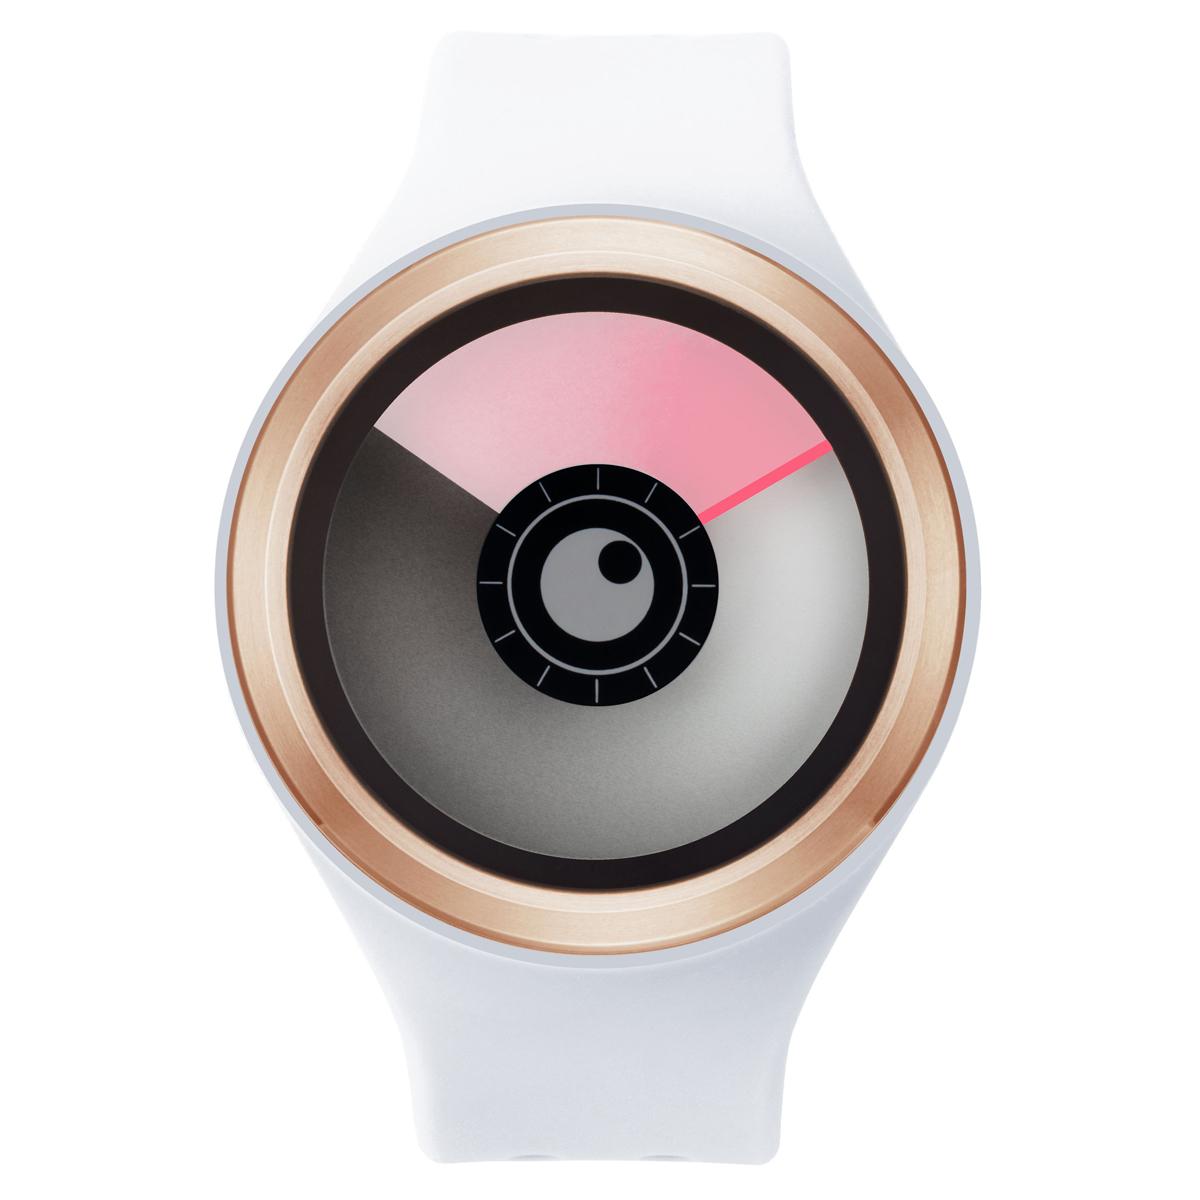 ZEROO AURORA BOREALIS ゼロ 電池式クォーツ 腕時計 [W00701B05SR01] ホワイト デザインウォッチ ペア用 メンズ レディース ユニセックス おしゃれ時計 デザイナーズ